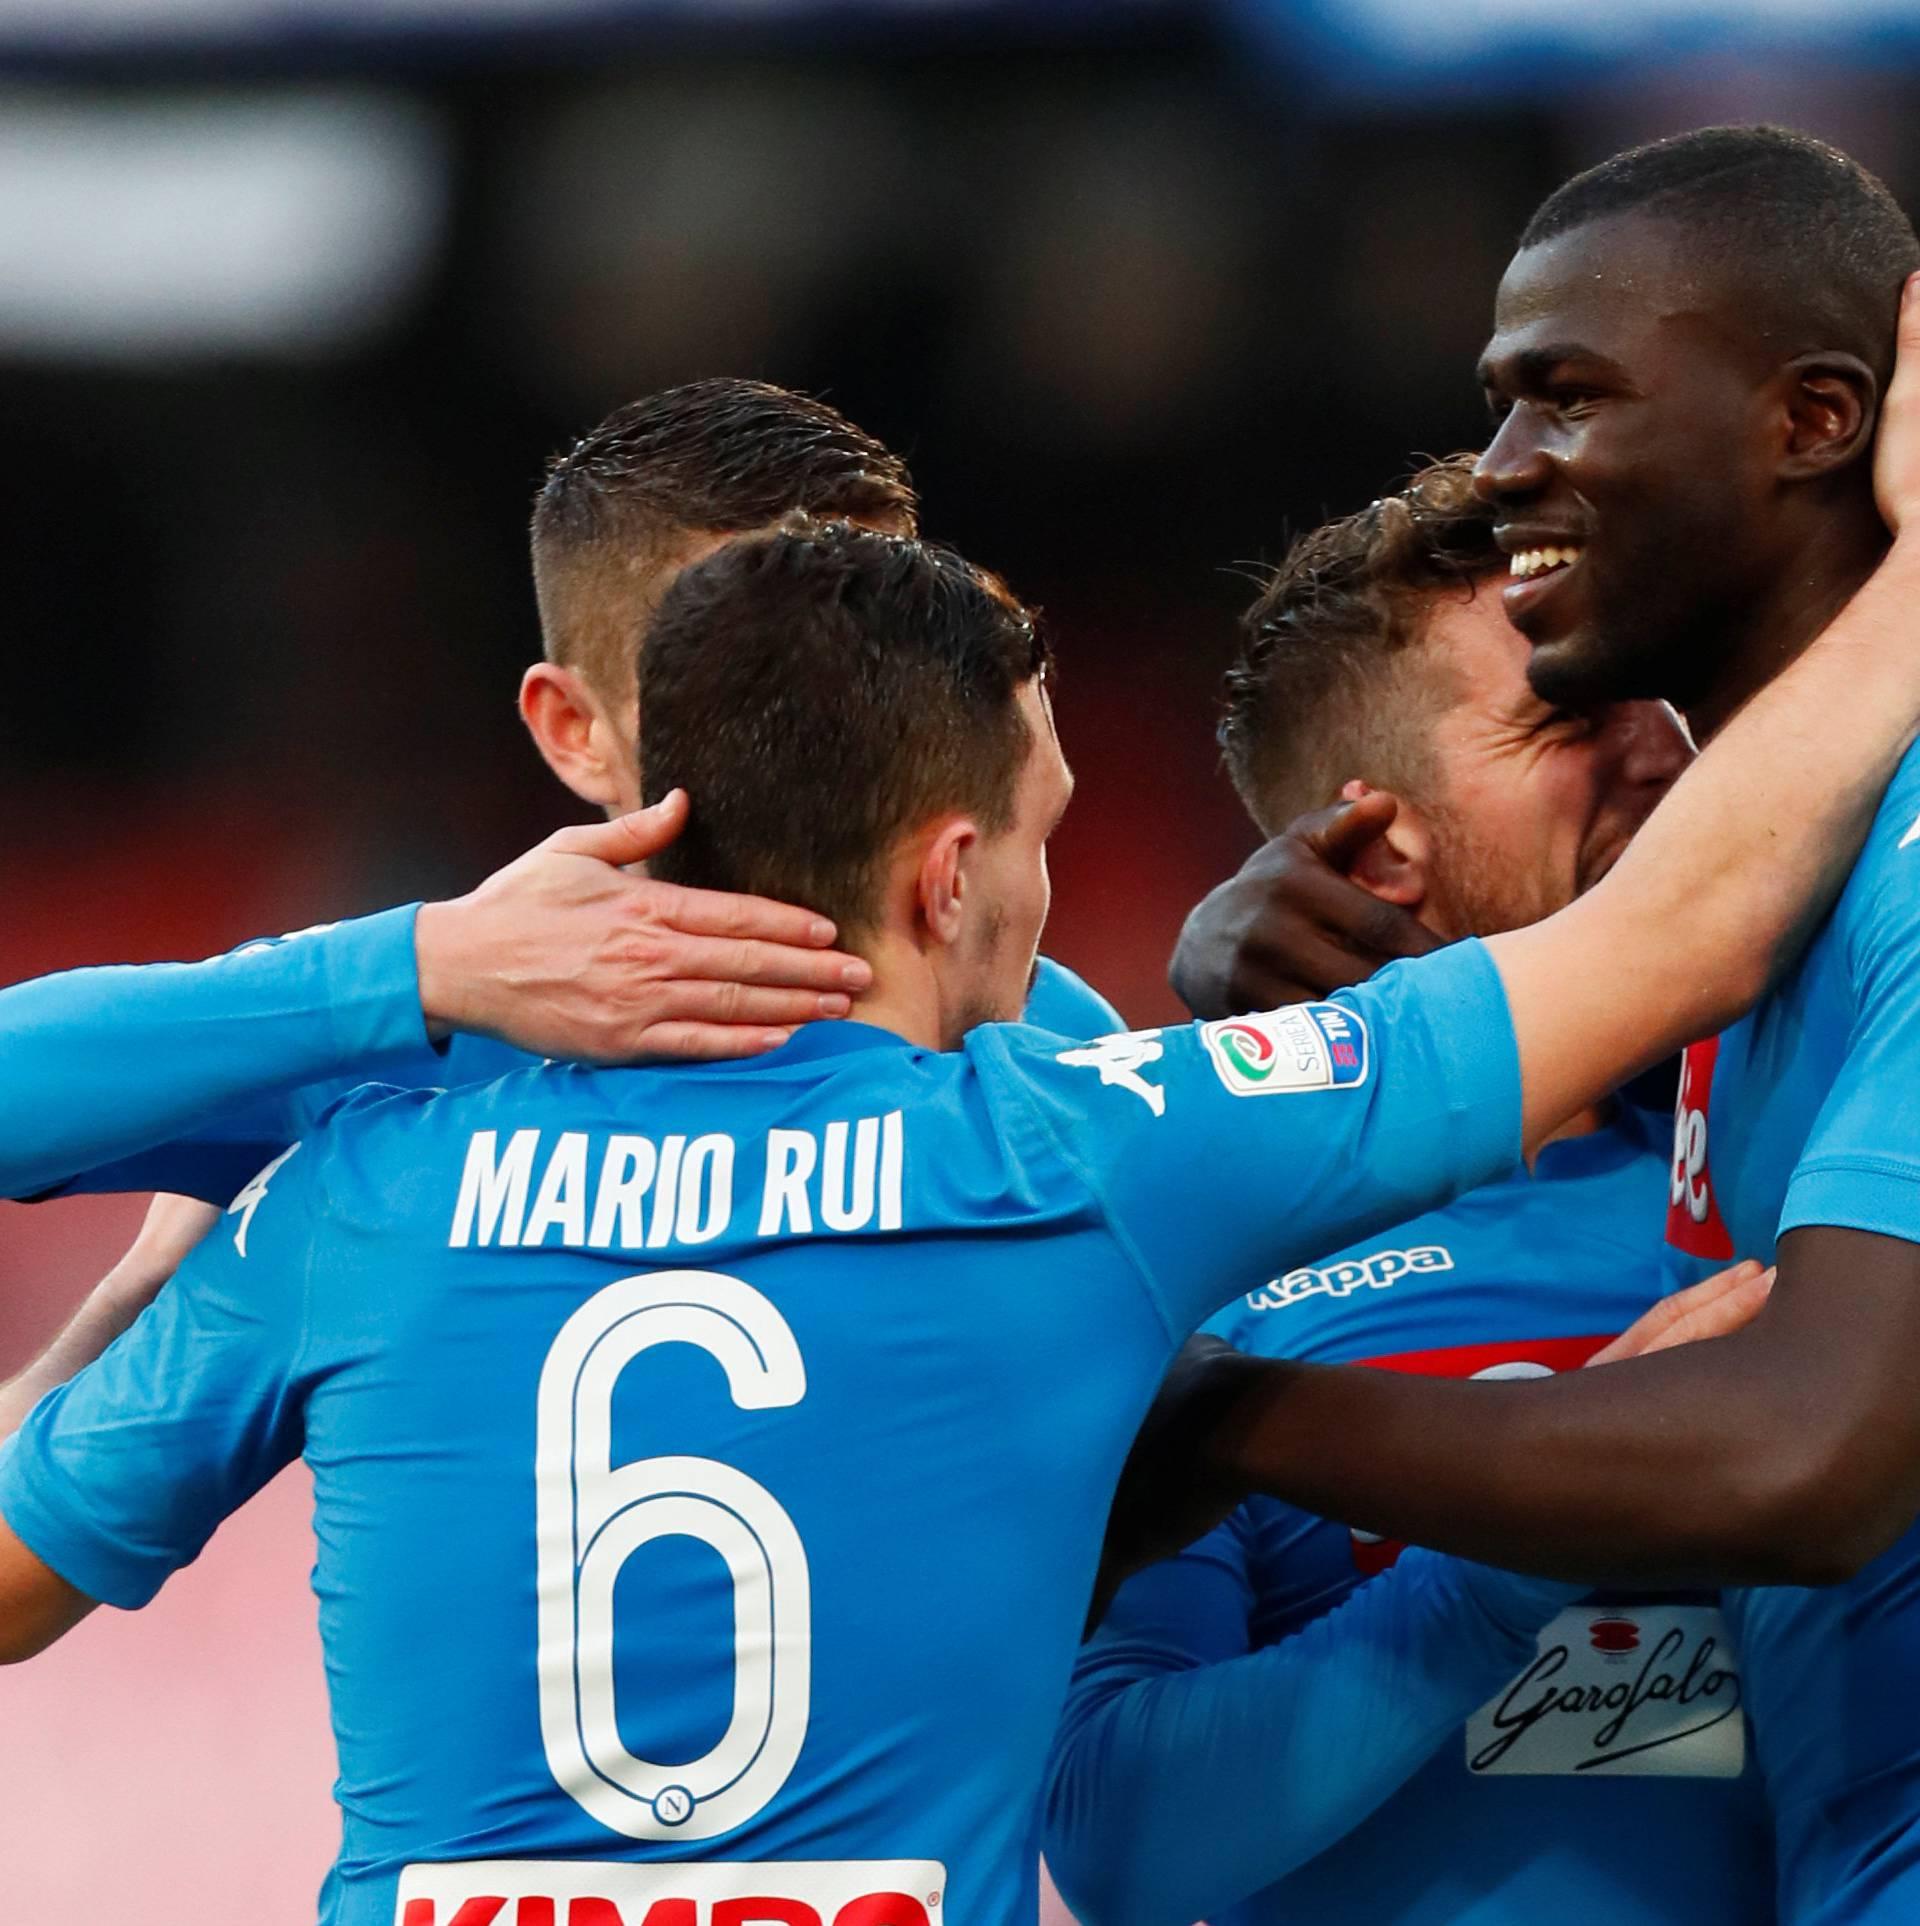 Serie A - Napoli vs Hellas Verona